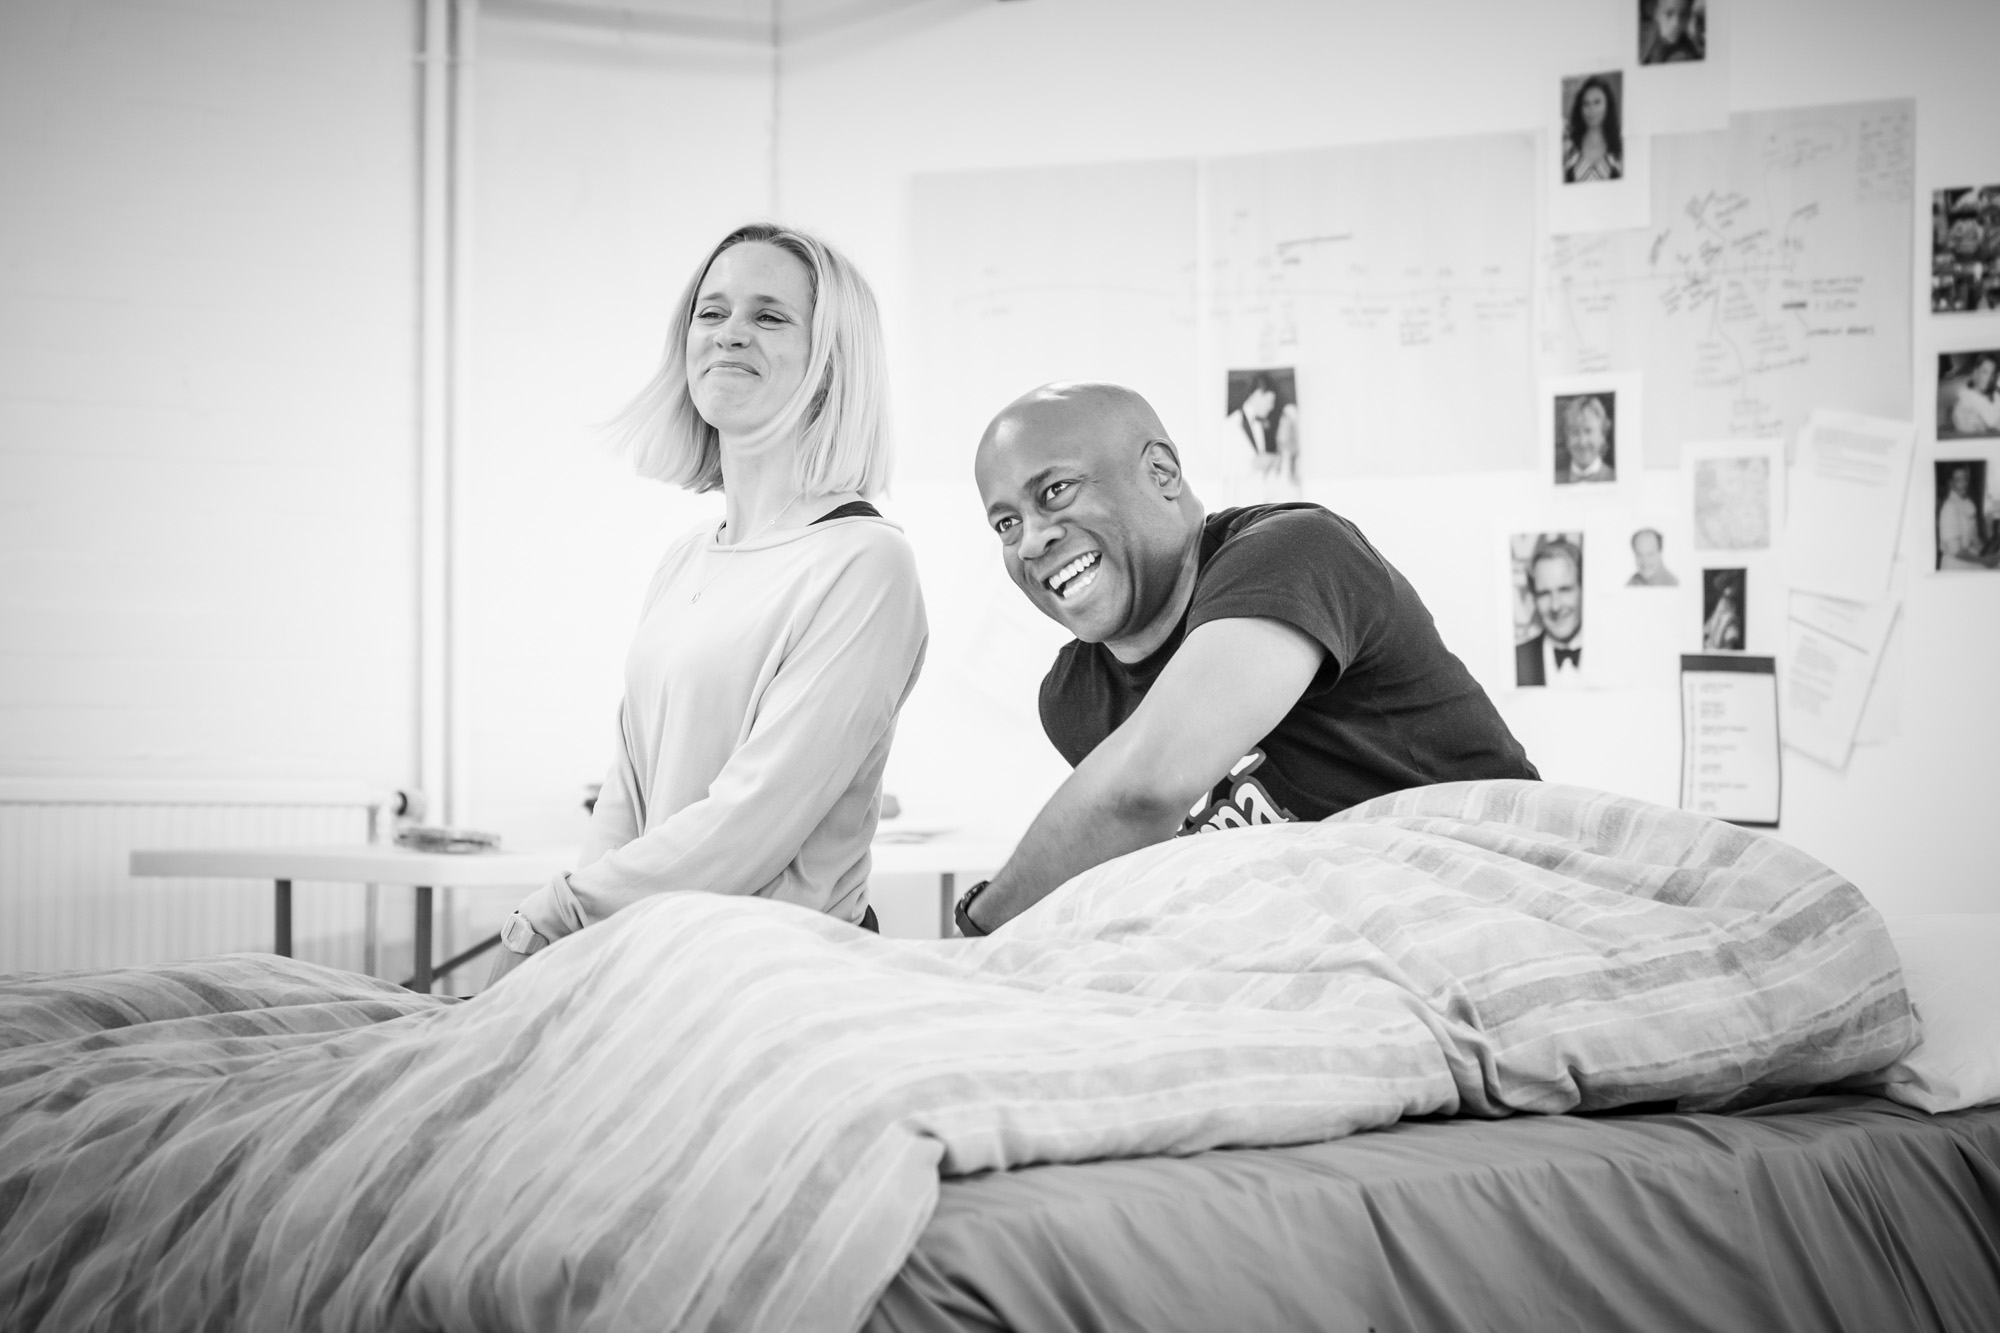 The Memory of Water • Nottingham Playhouse • Dir. Adele Turner